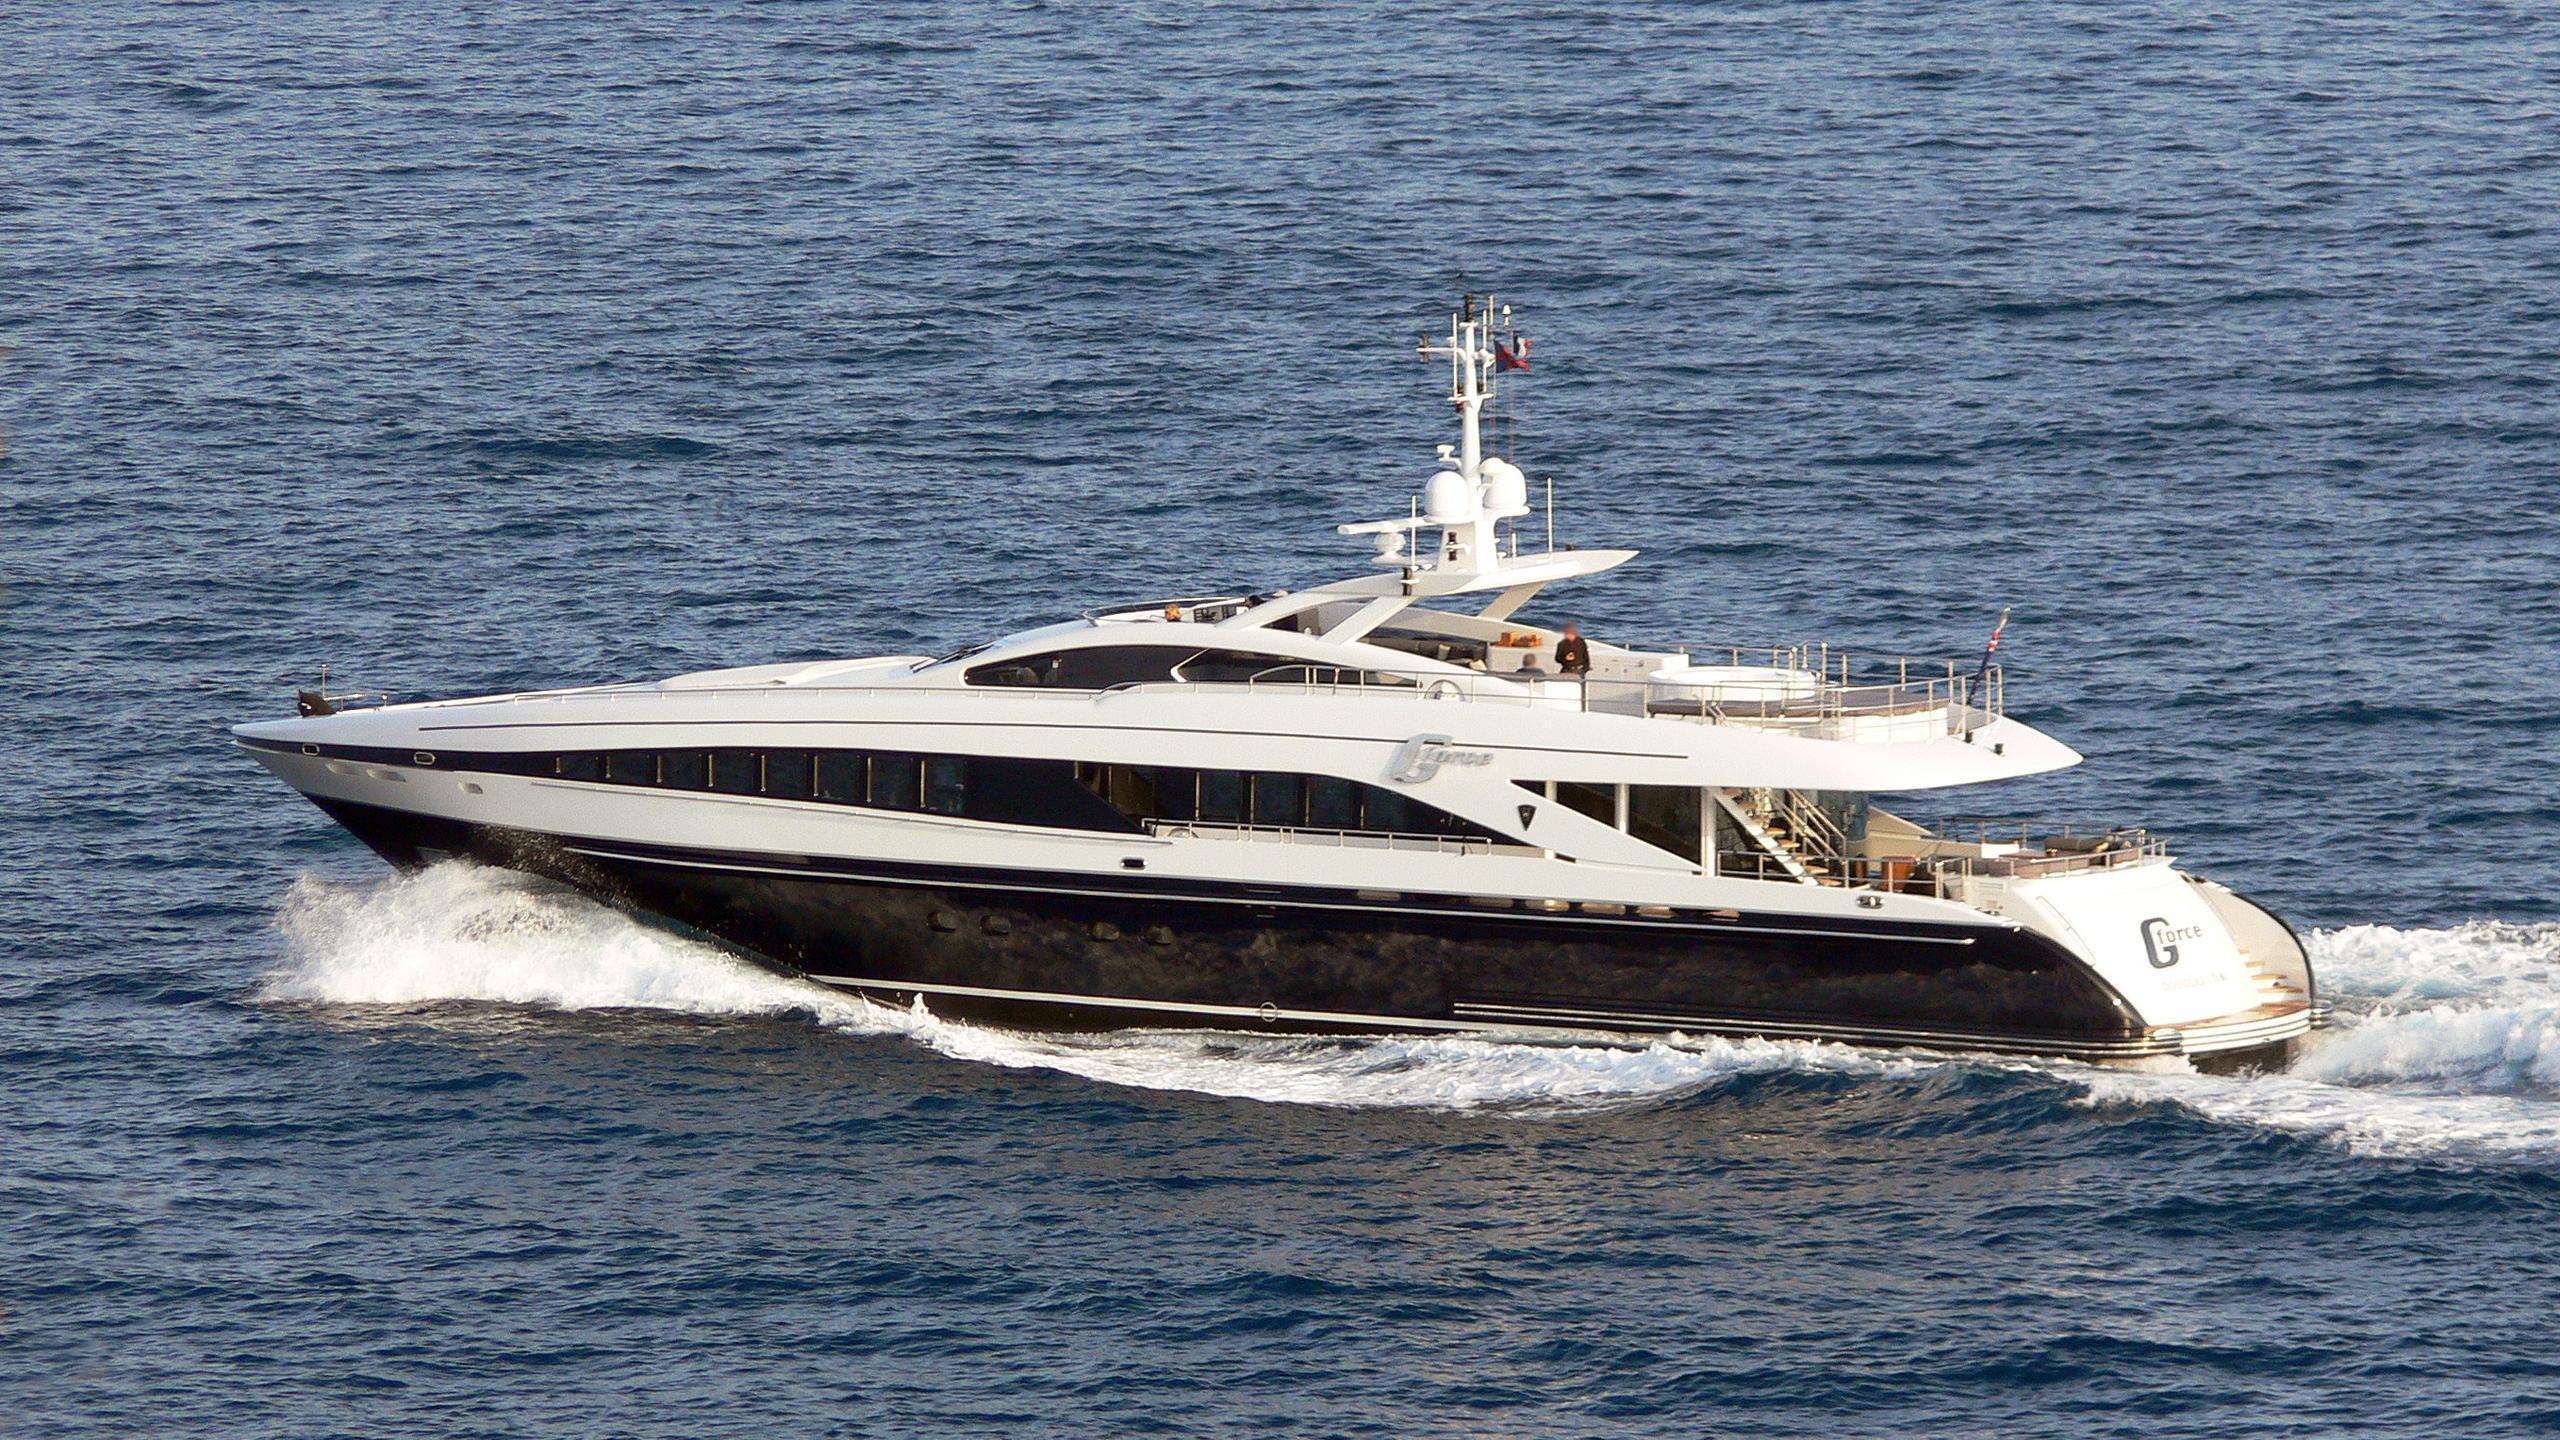 g-force-motor-yacht-heesen-3700-2006-37m-cruising